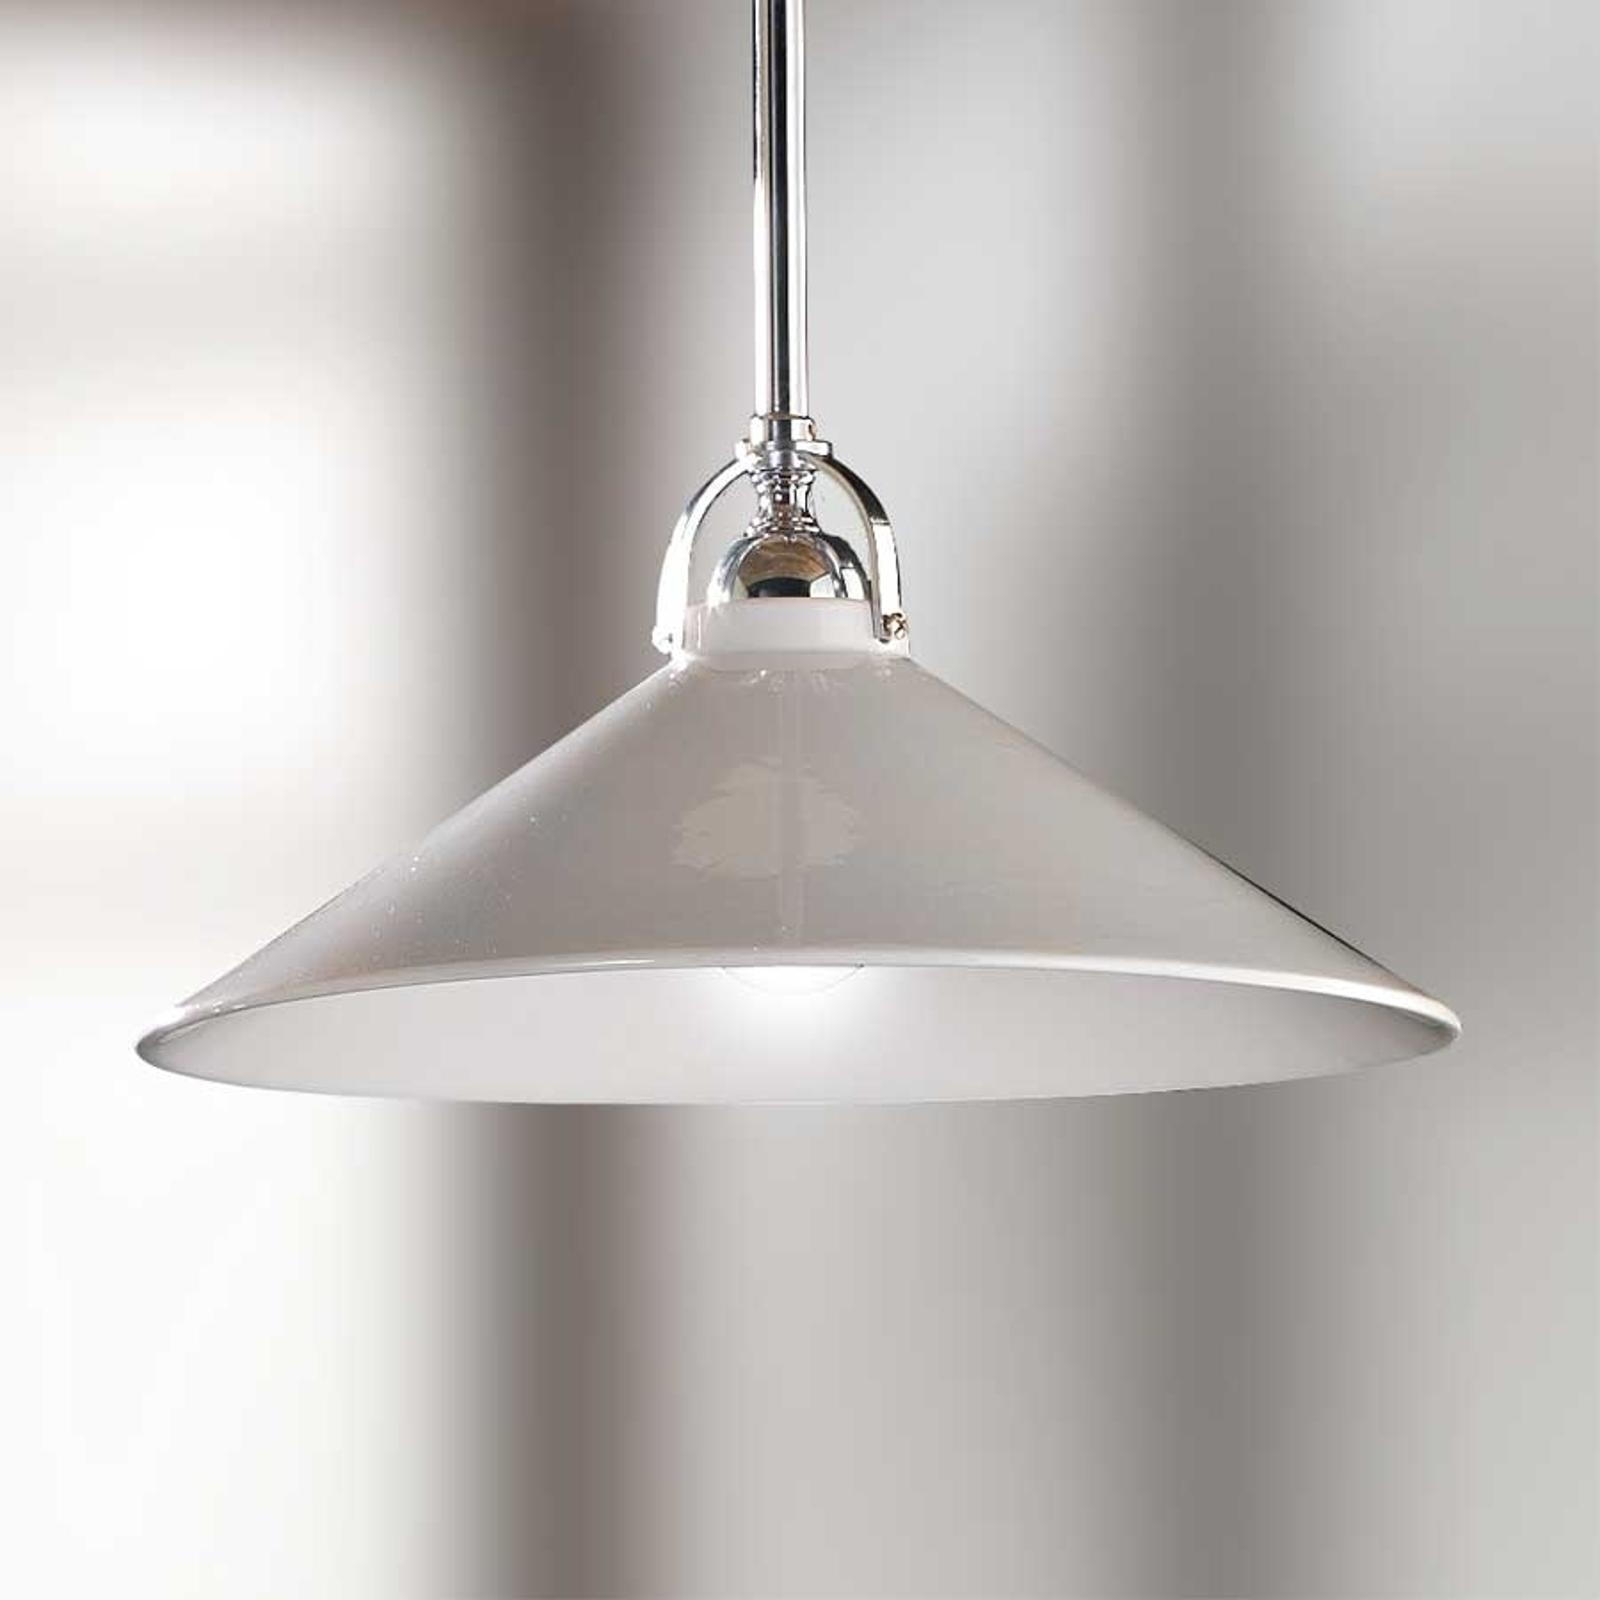 Biała lampa wisząca GIACOMO